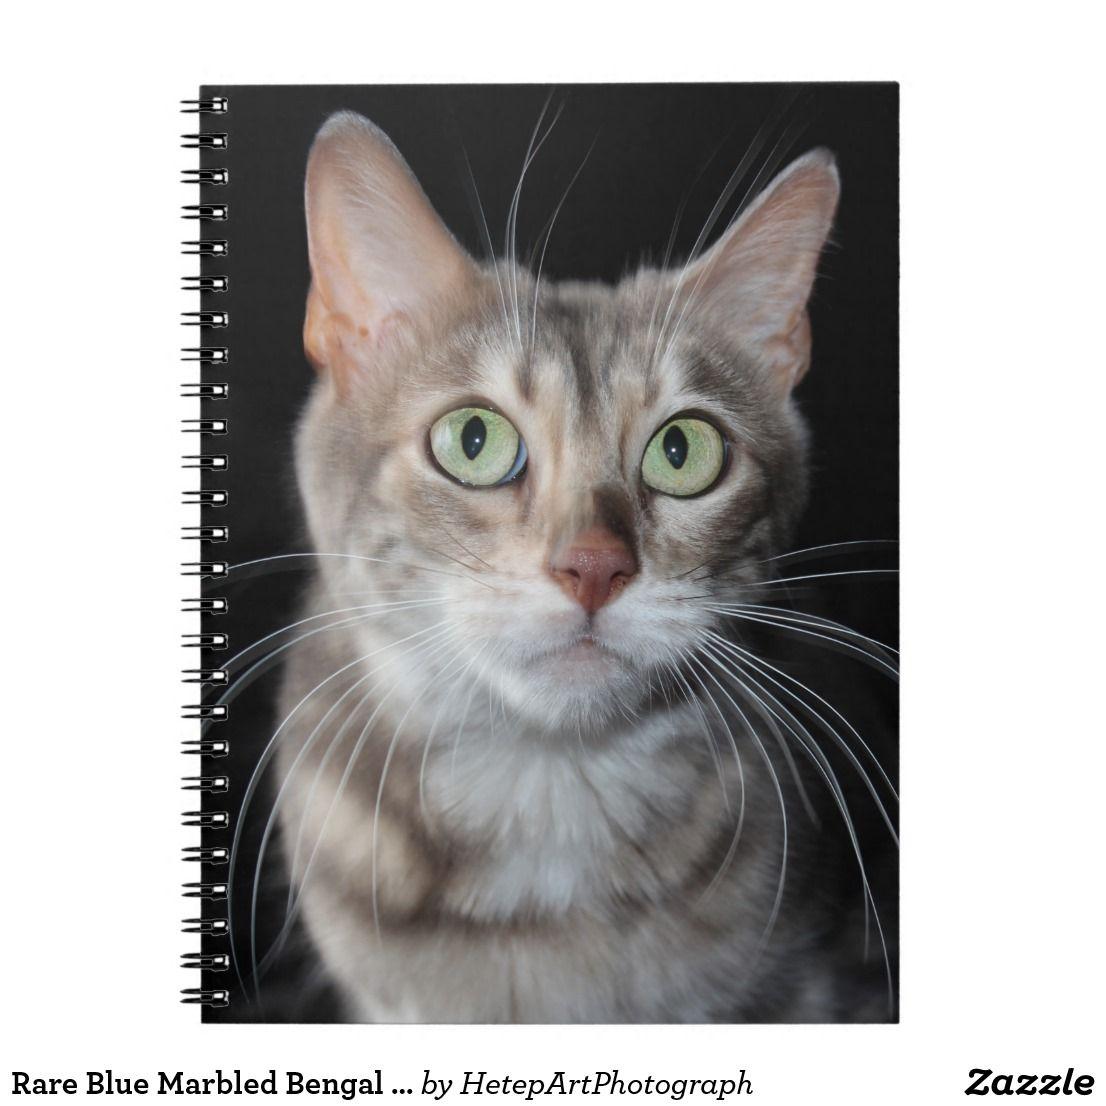 Rare Blue Marbled Bengal Cat Photograph Spiral Notebook Zazzle